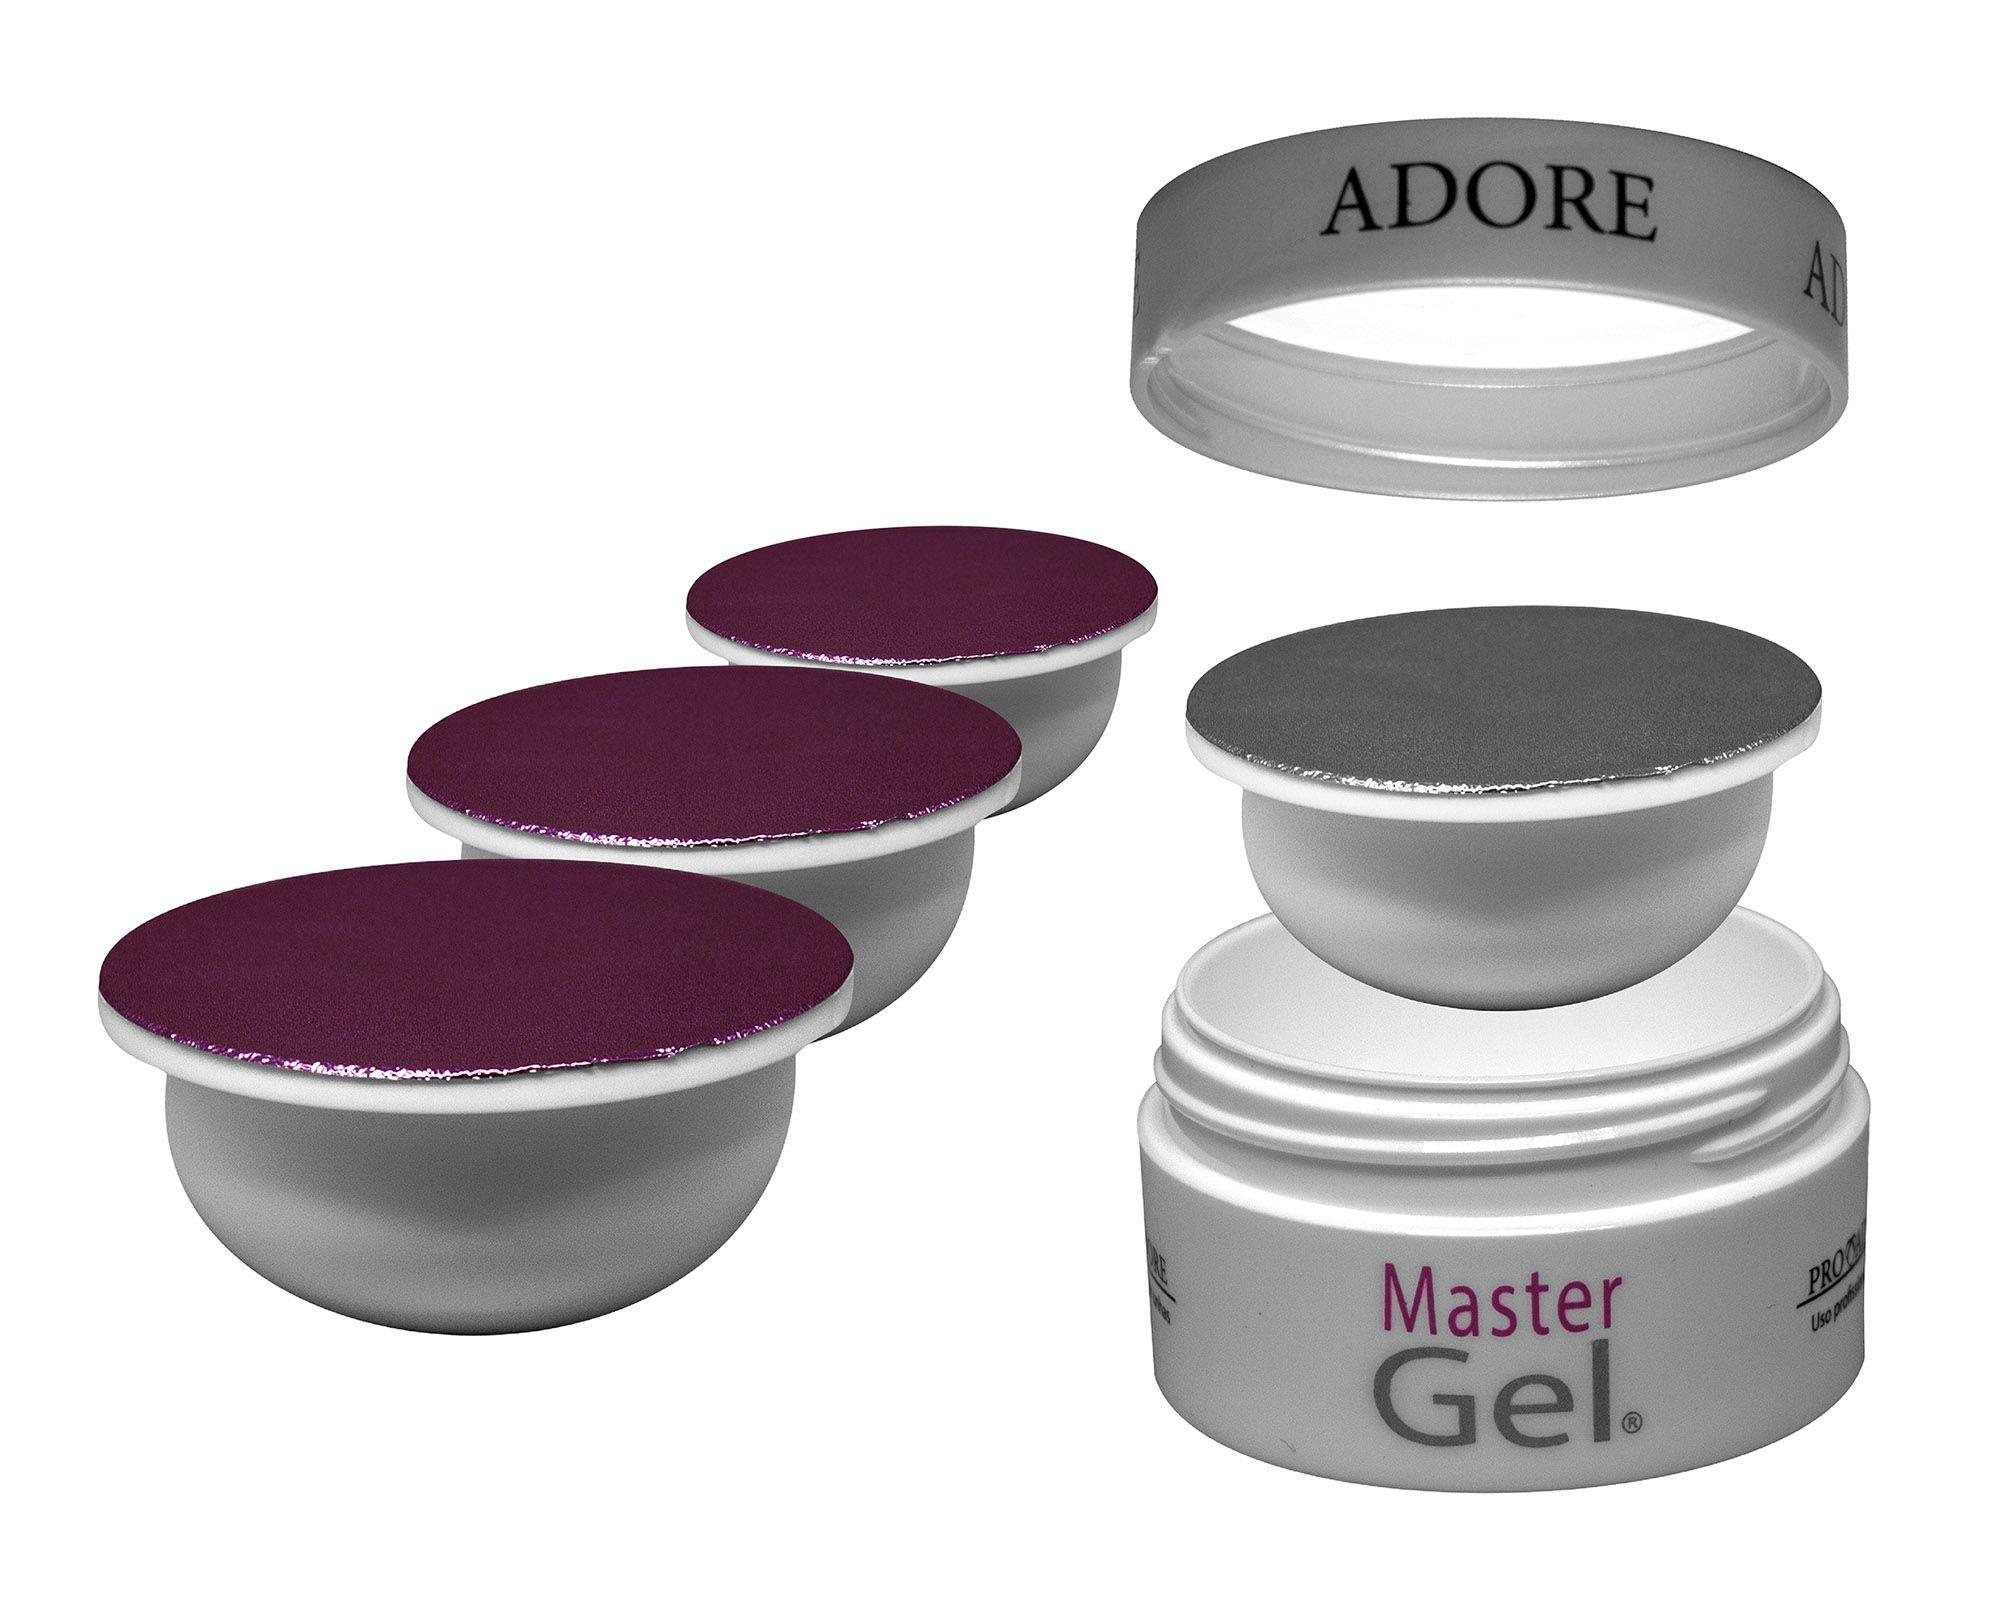 Kit Refil - 3 Adore Master Gel Pink + 1 Adore Master Gel Clear